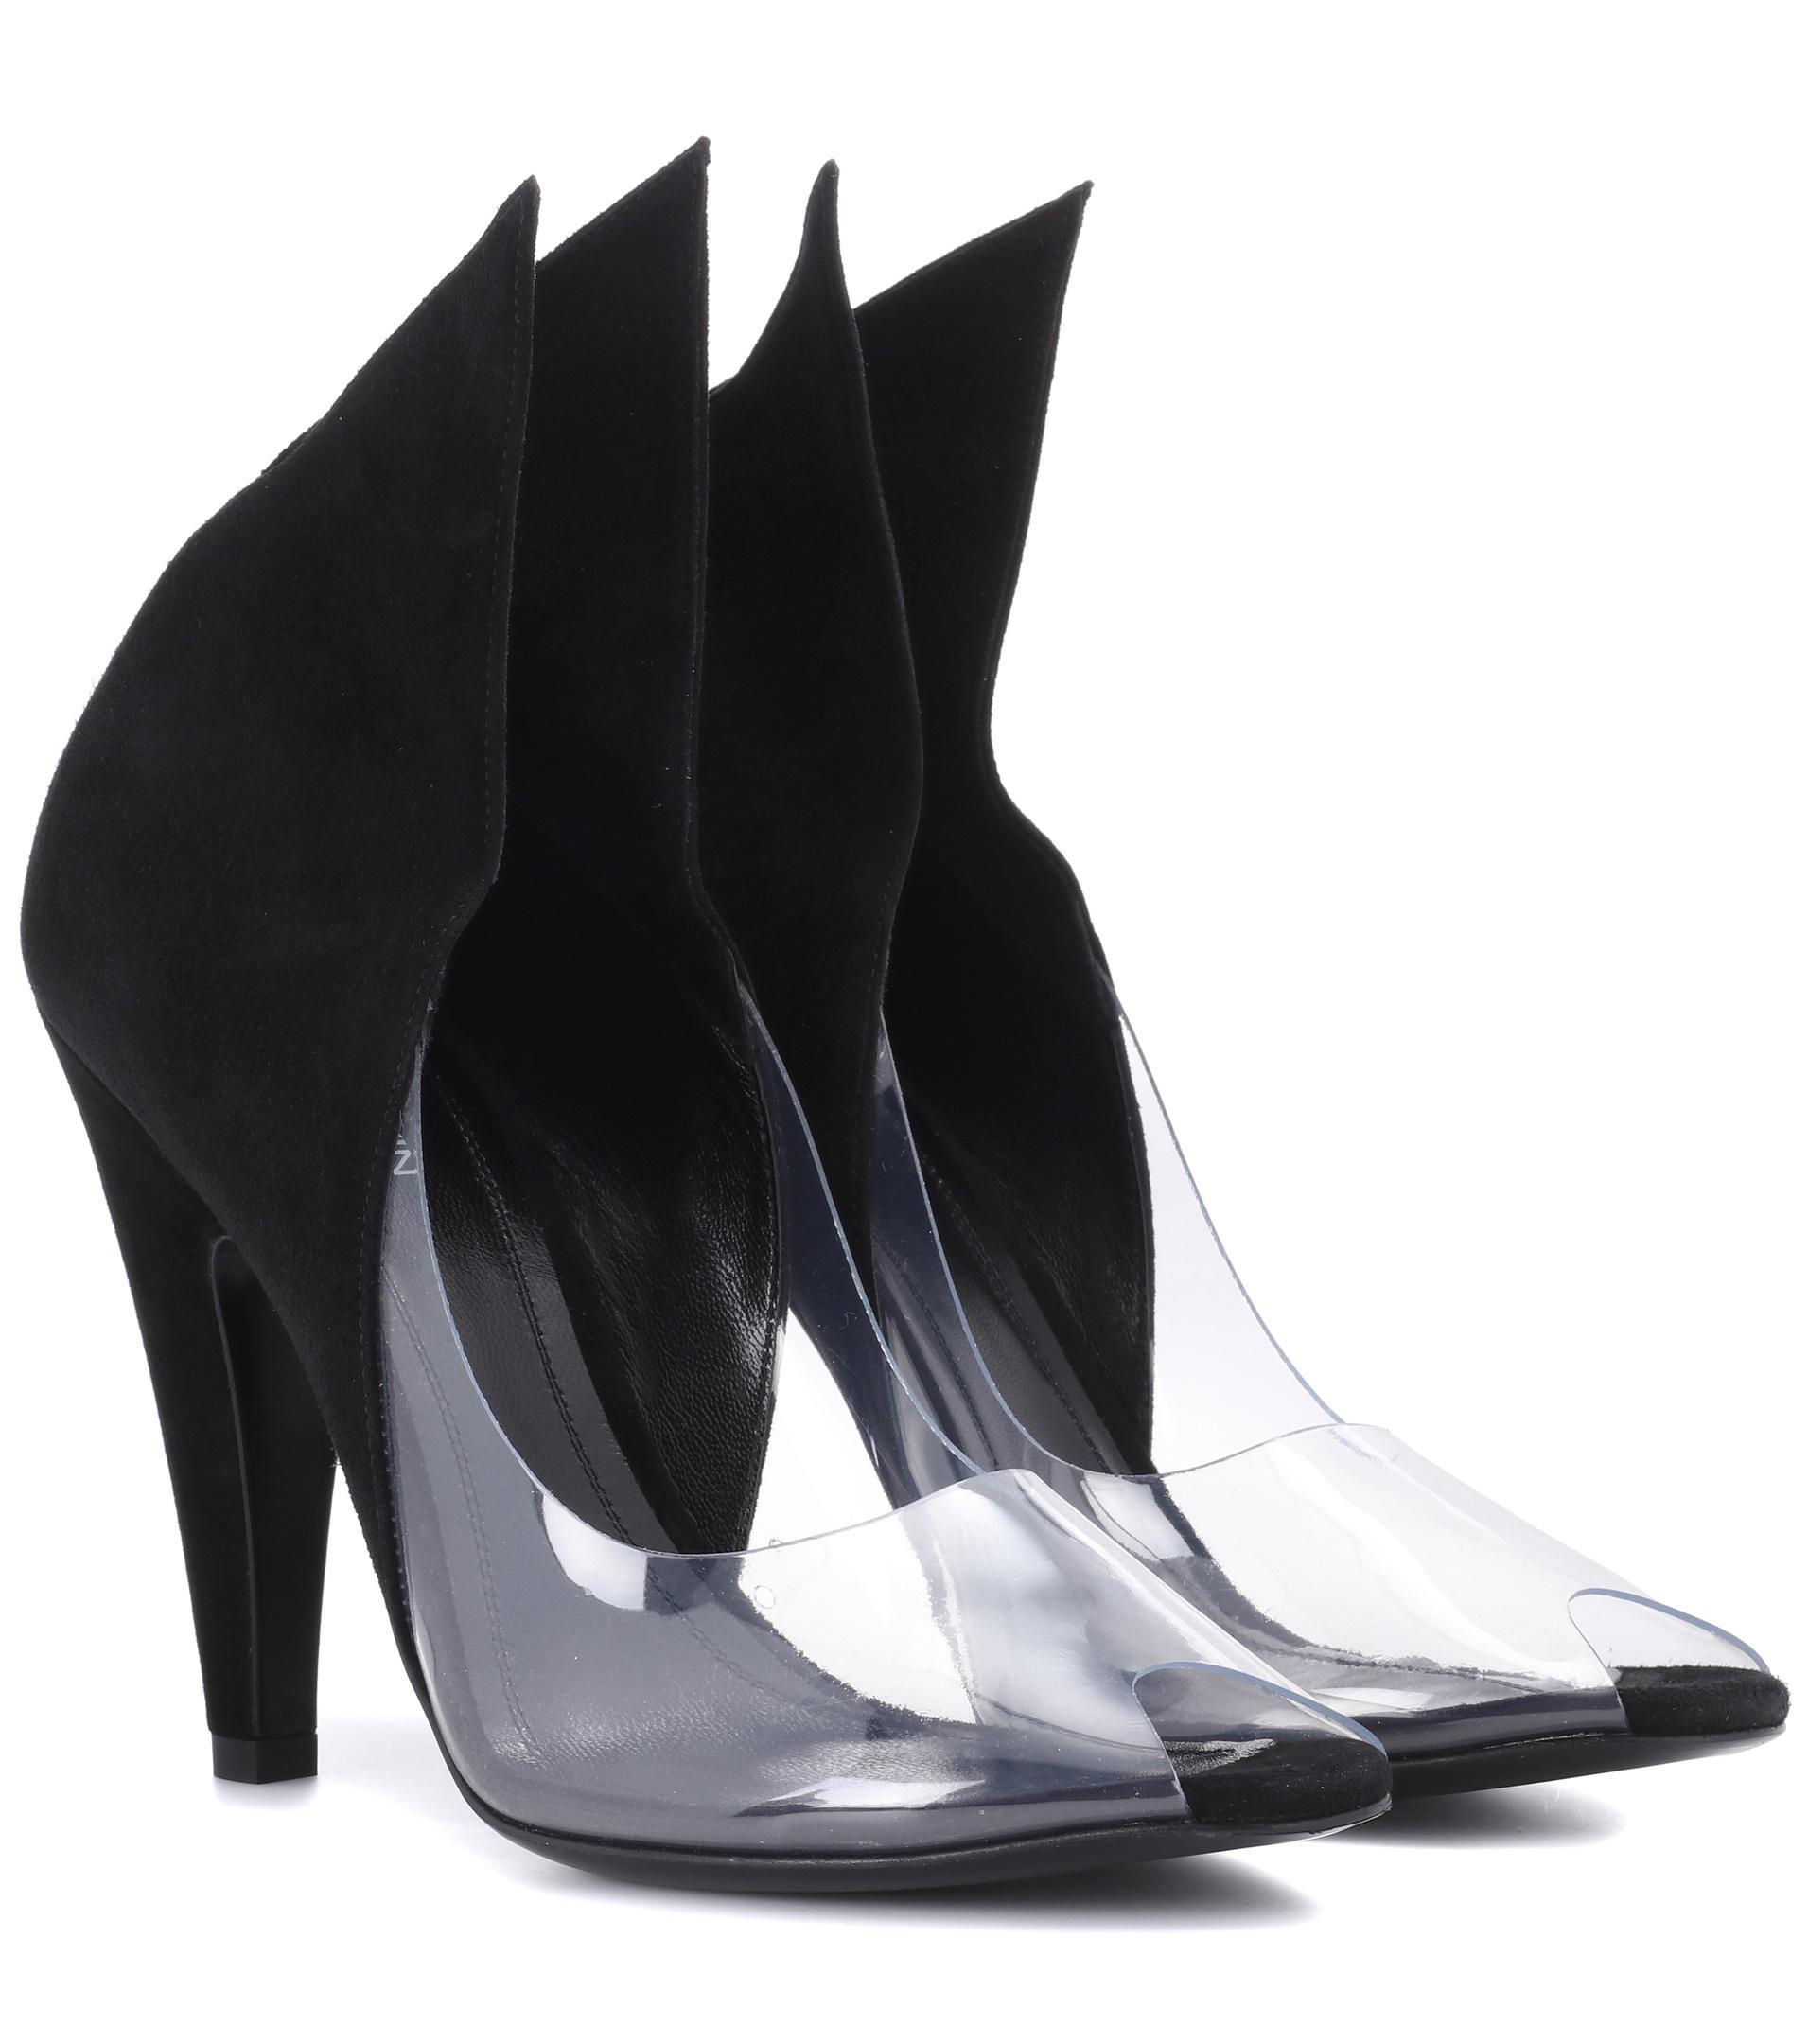 4a62902d98b0 Calvin Klein 205W39Nyc Kahlo Suede Peep-toe Pumps in Black - Lyst